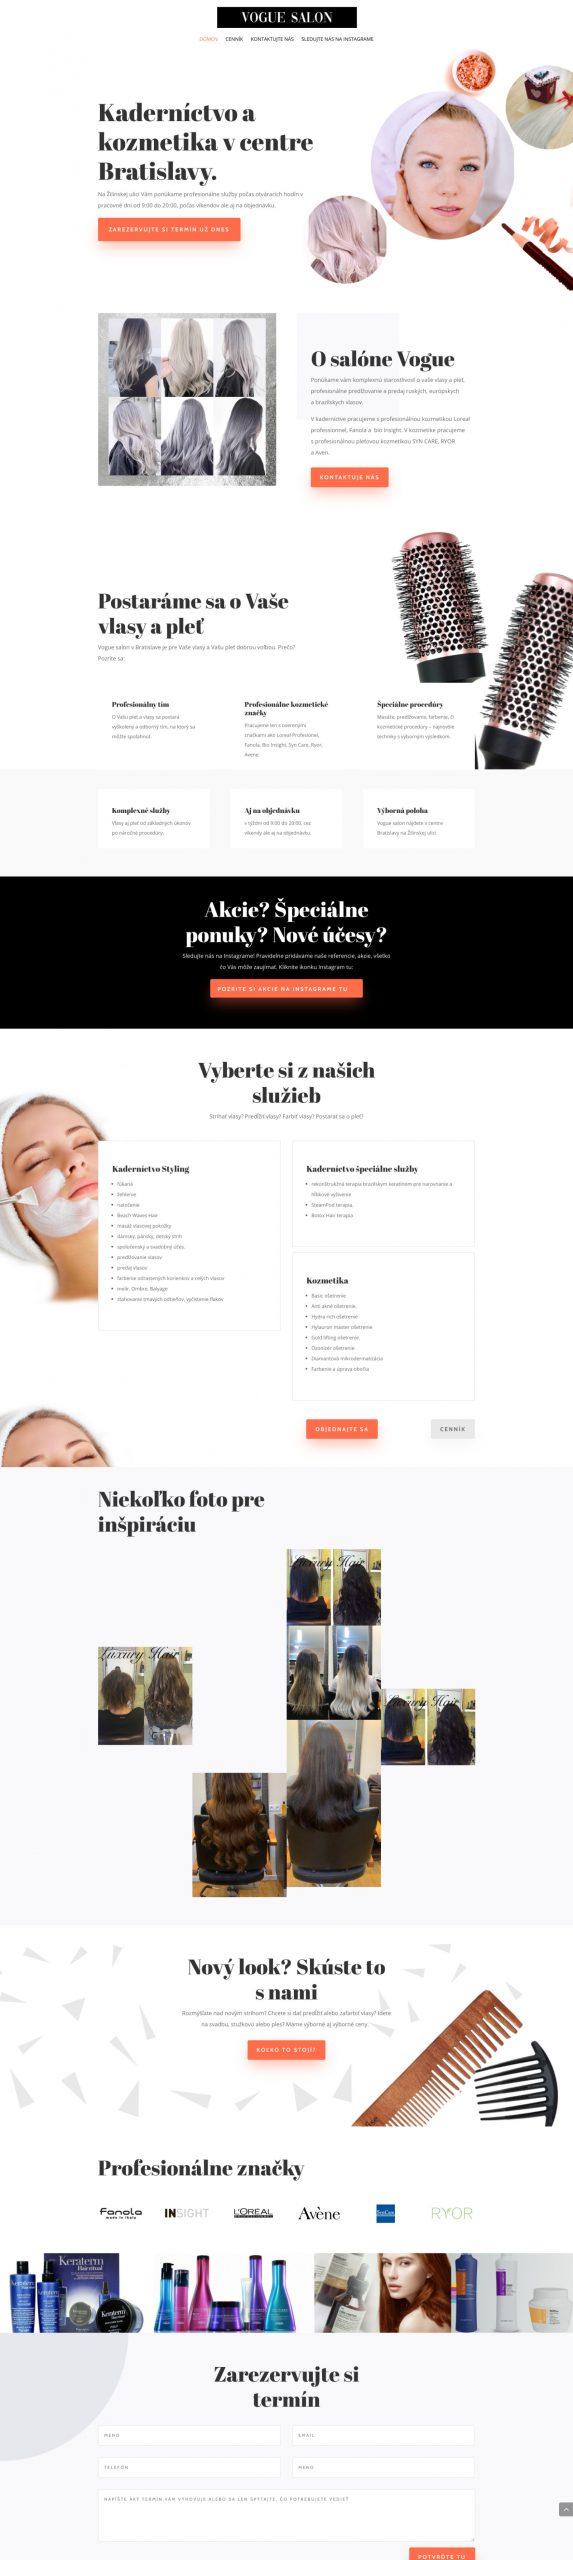 Protopia.sk | Screenshot |Porfólio | Kanas-sro - pneumatiky